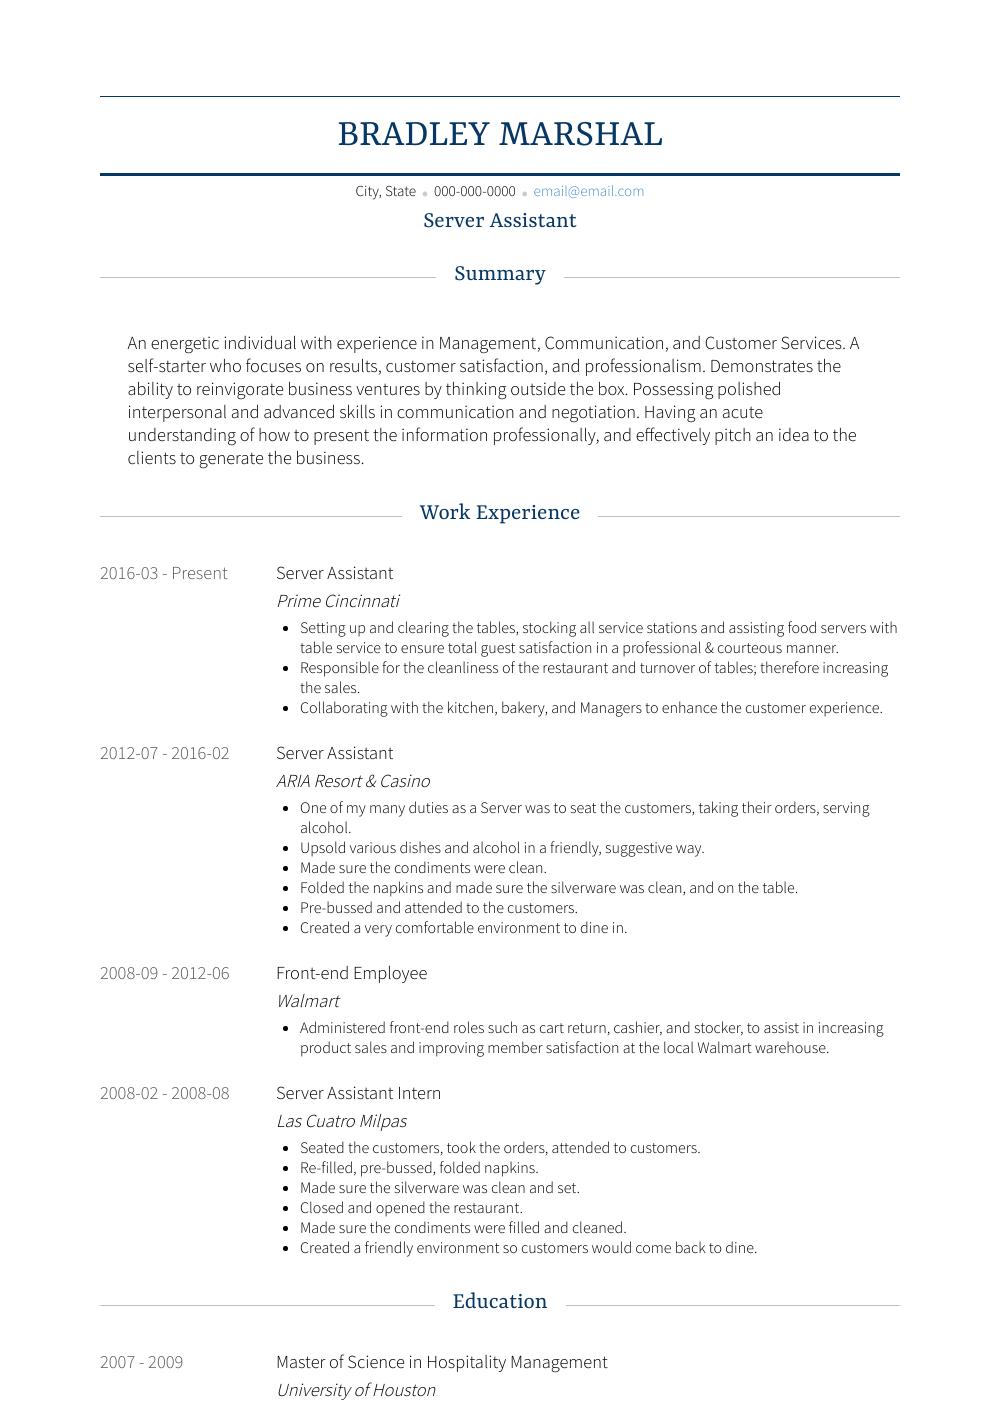 Server Assistant   Resume Samples & Templates | VisualCV